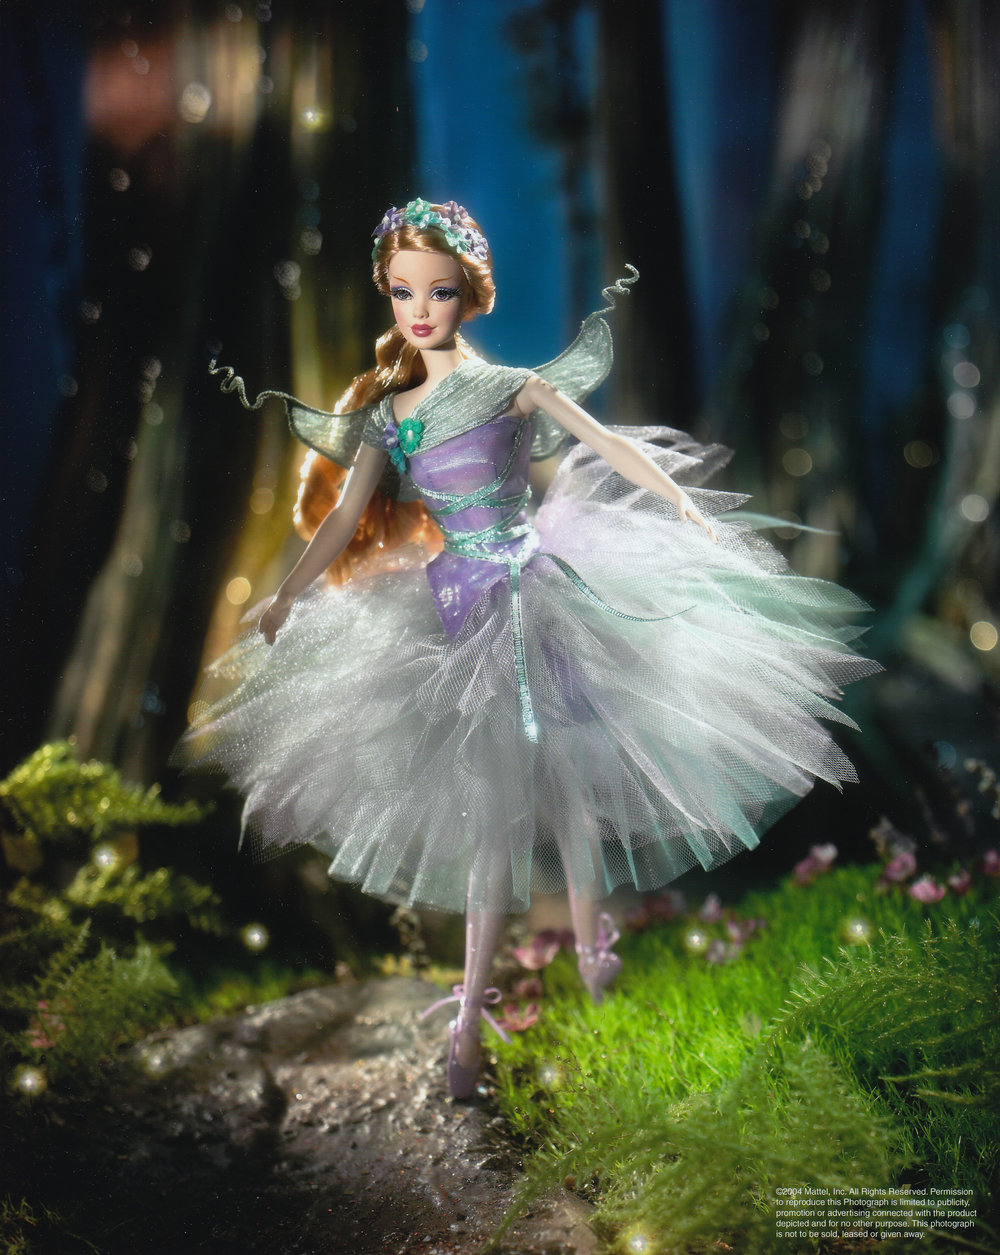 Barbie Doll as Titania